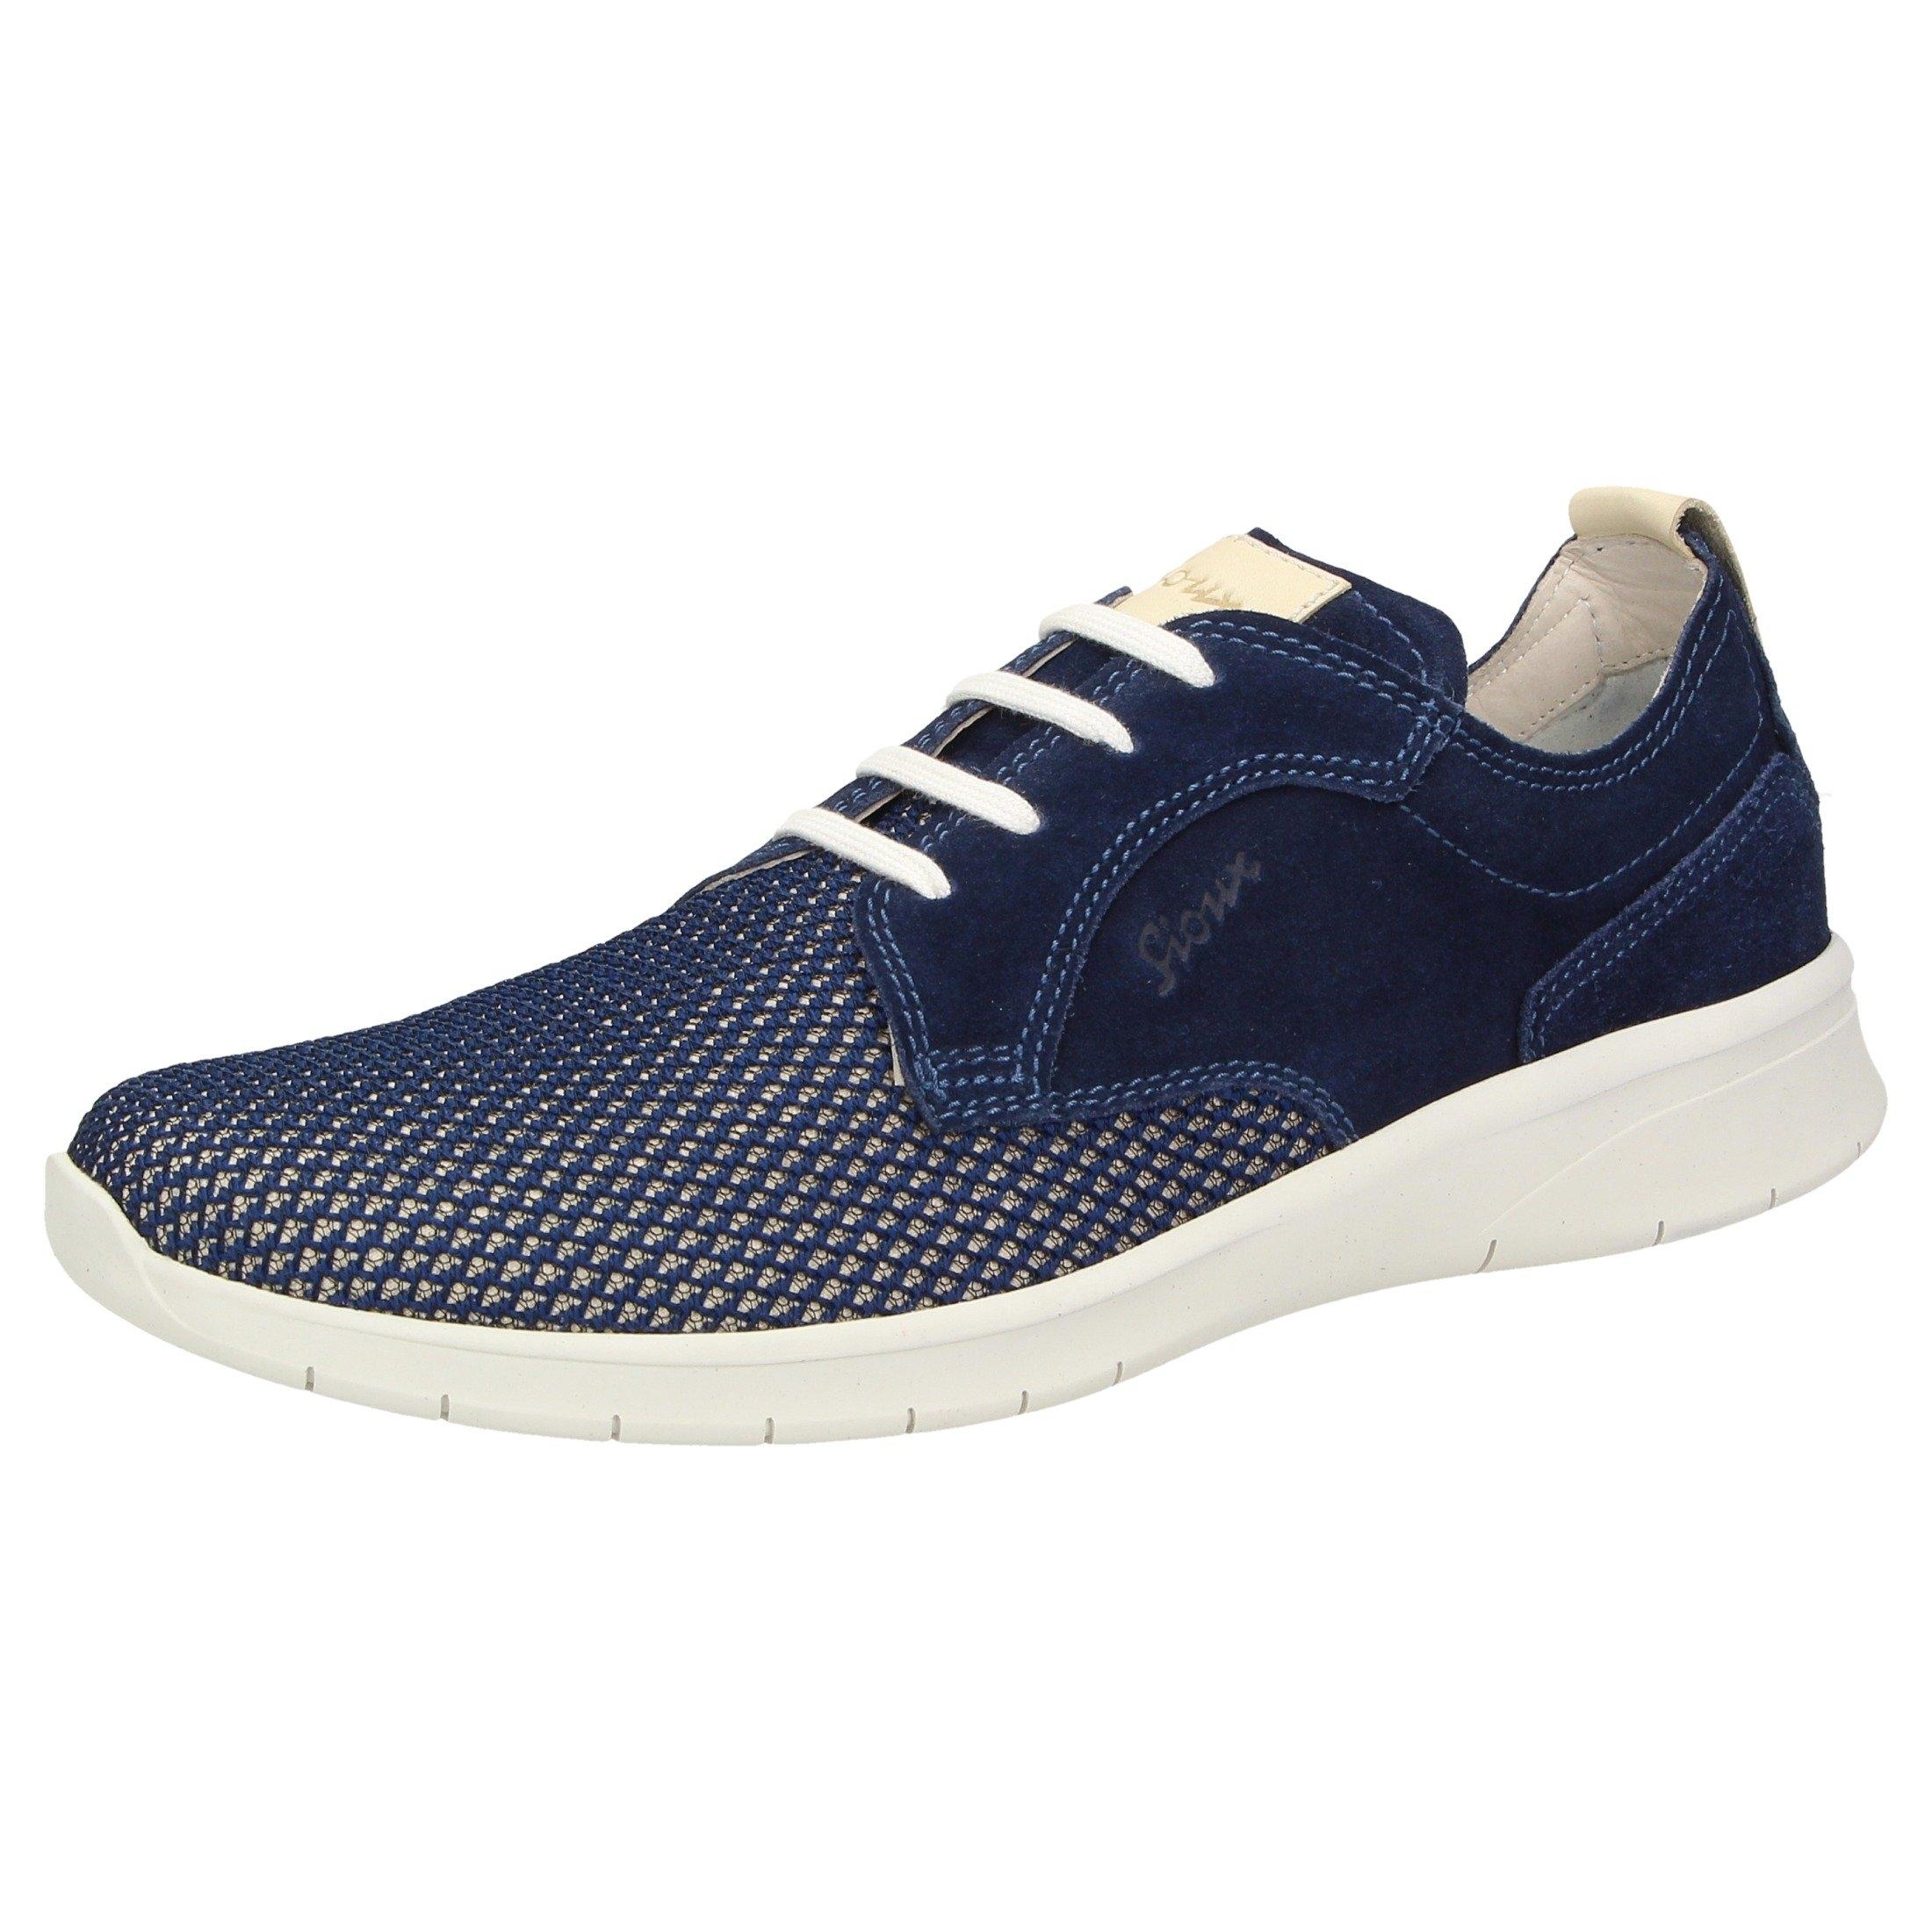 Sioux Sneaker »Heimito-700-XL« nu online kopen bij OTTO